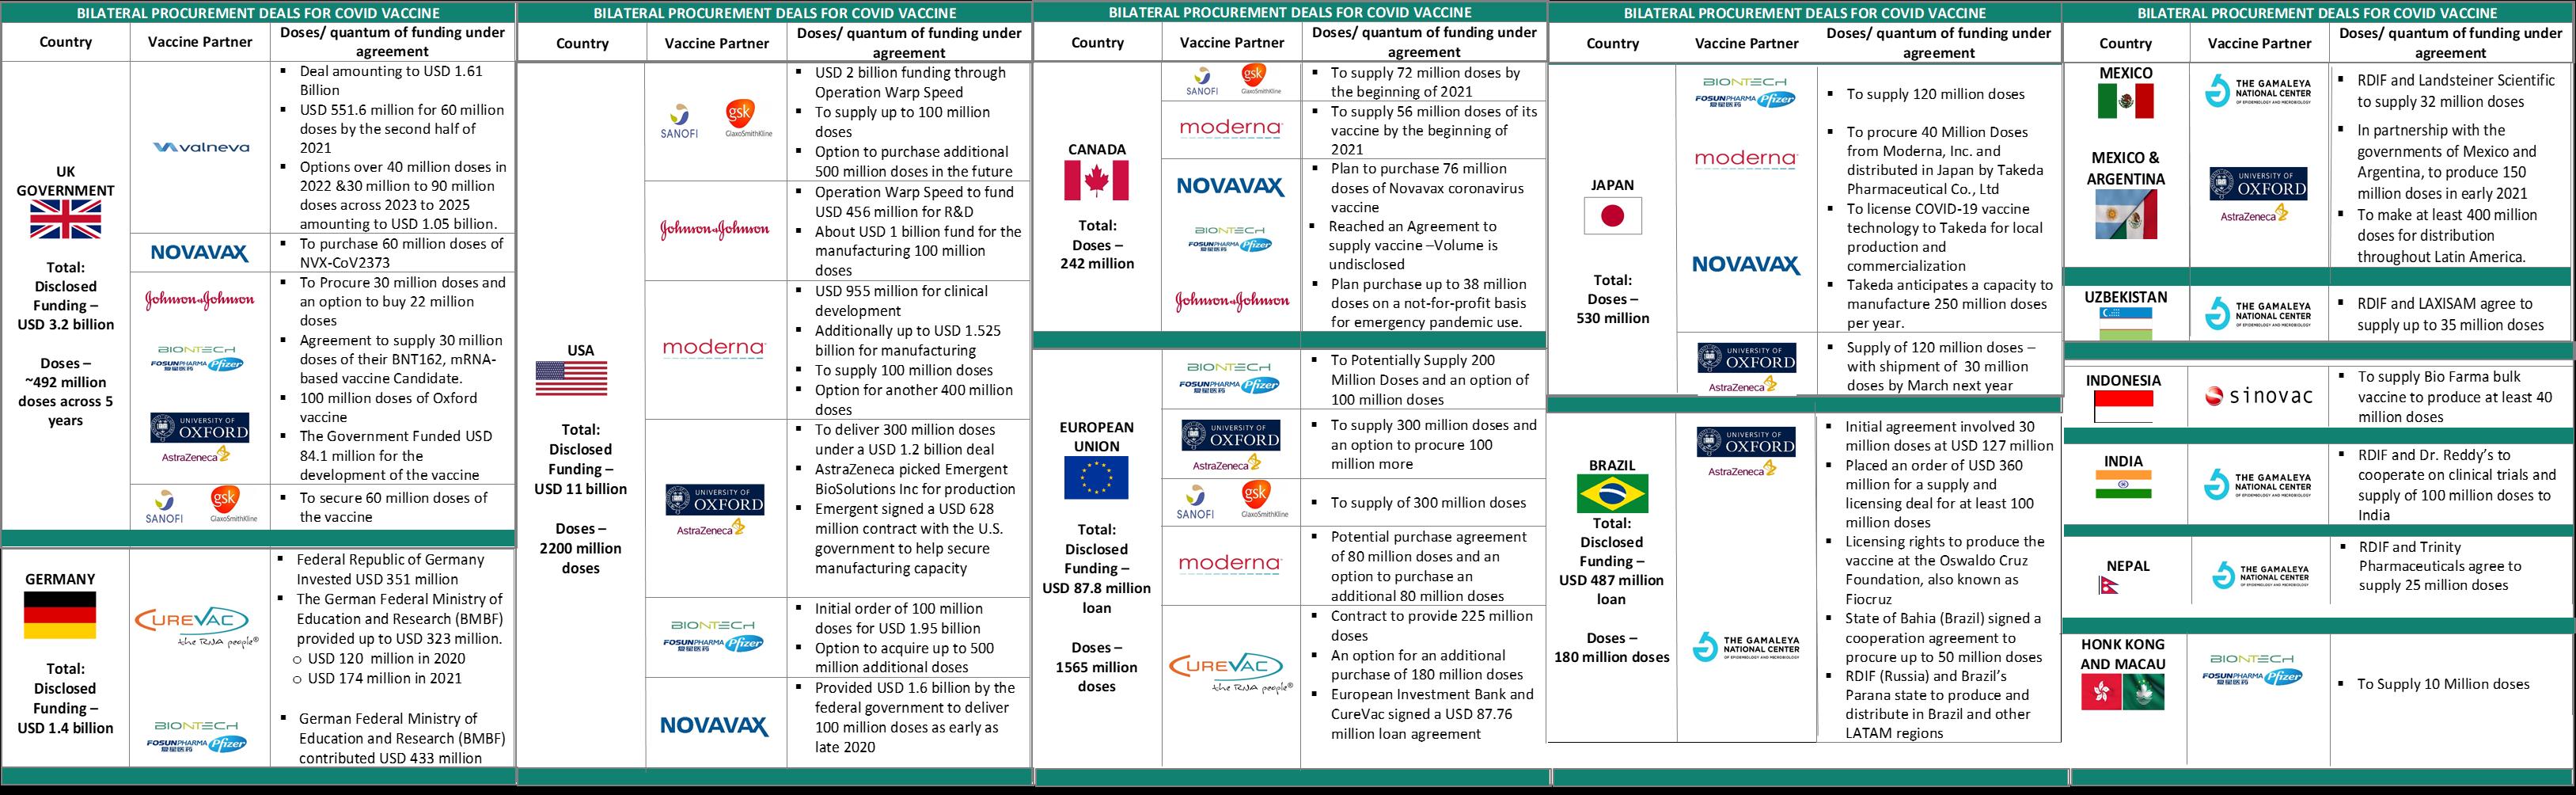 Bilateral deals table